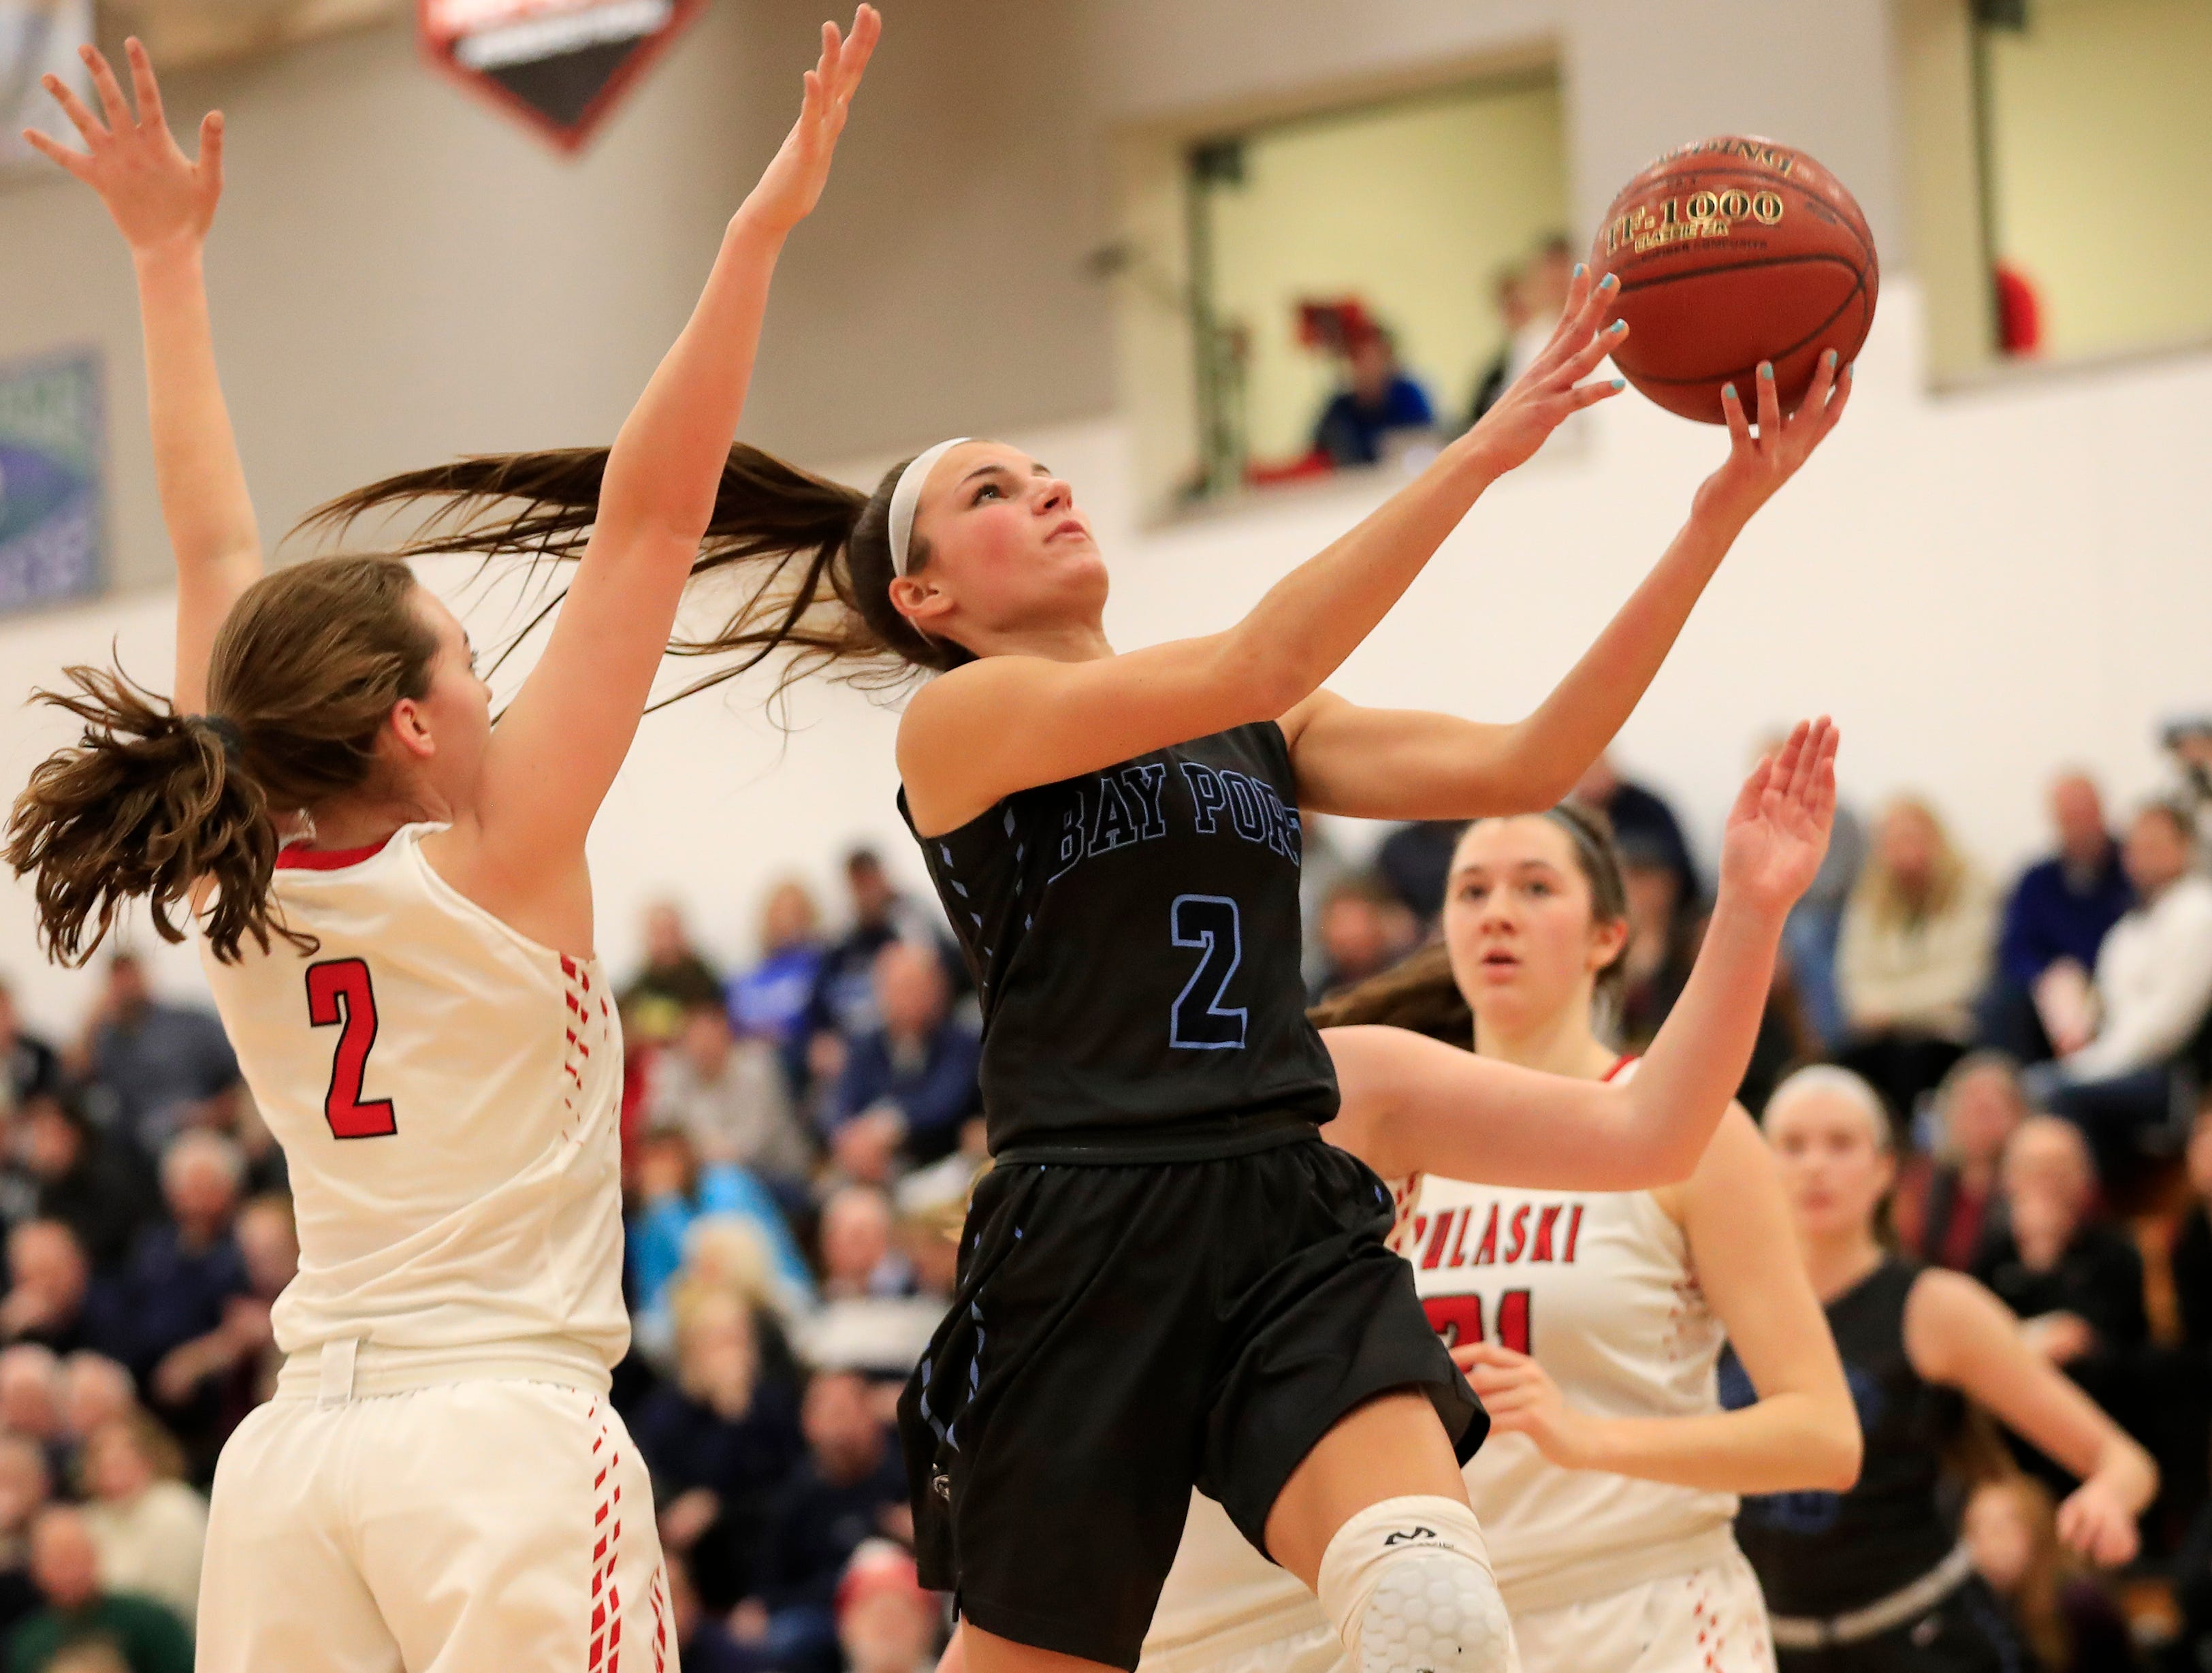 Bay Port's Grace Krause (2) scores past Pulaski's Isabel Majewski (2) in a girls basketball game at Pulaski high school on Friday, January 4, 2019 in Pulaski, Wis.